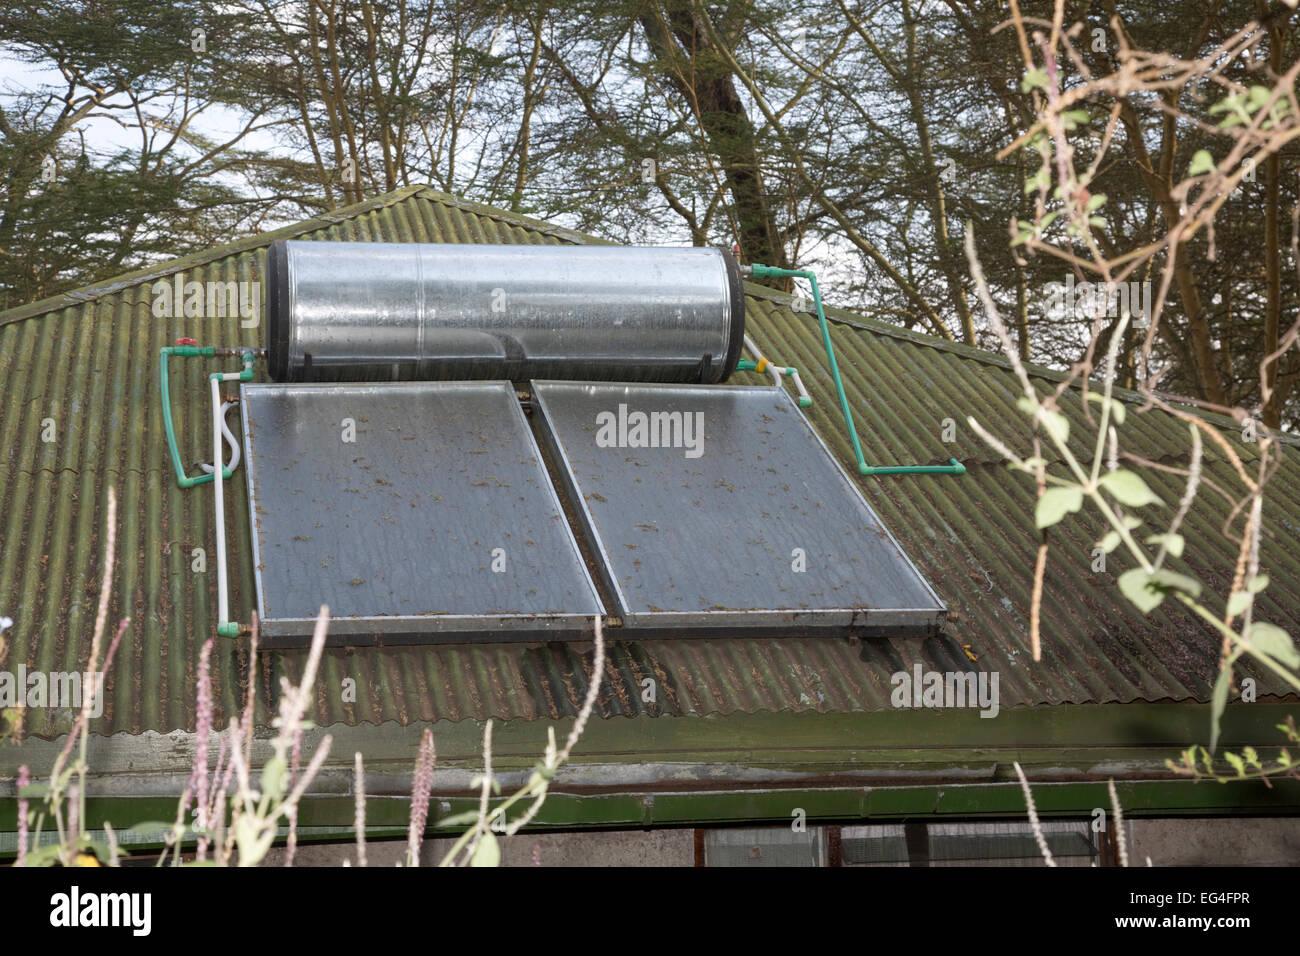 Solar thermal hot water system on roof of cottage Elsamere Kenya - Stock Image